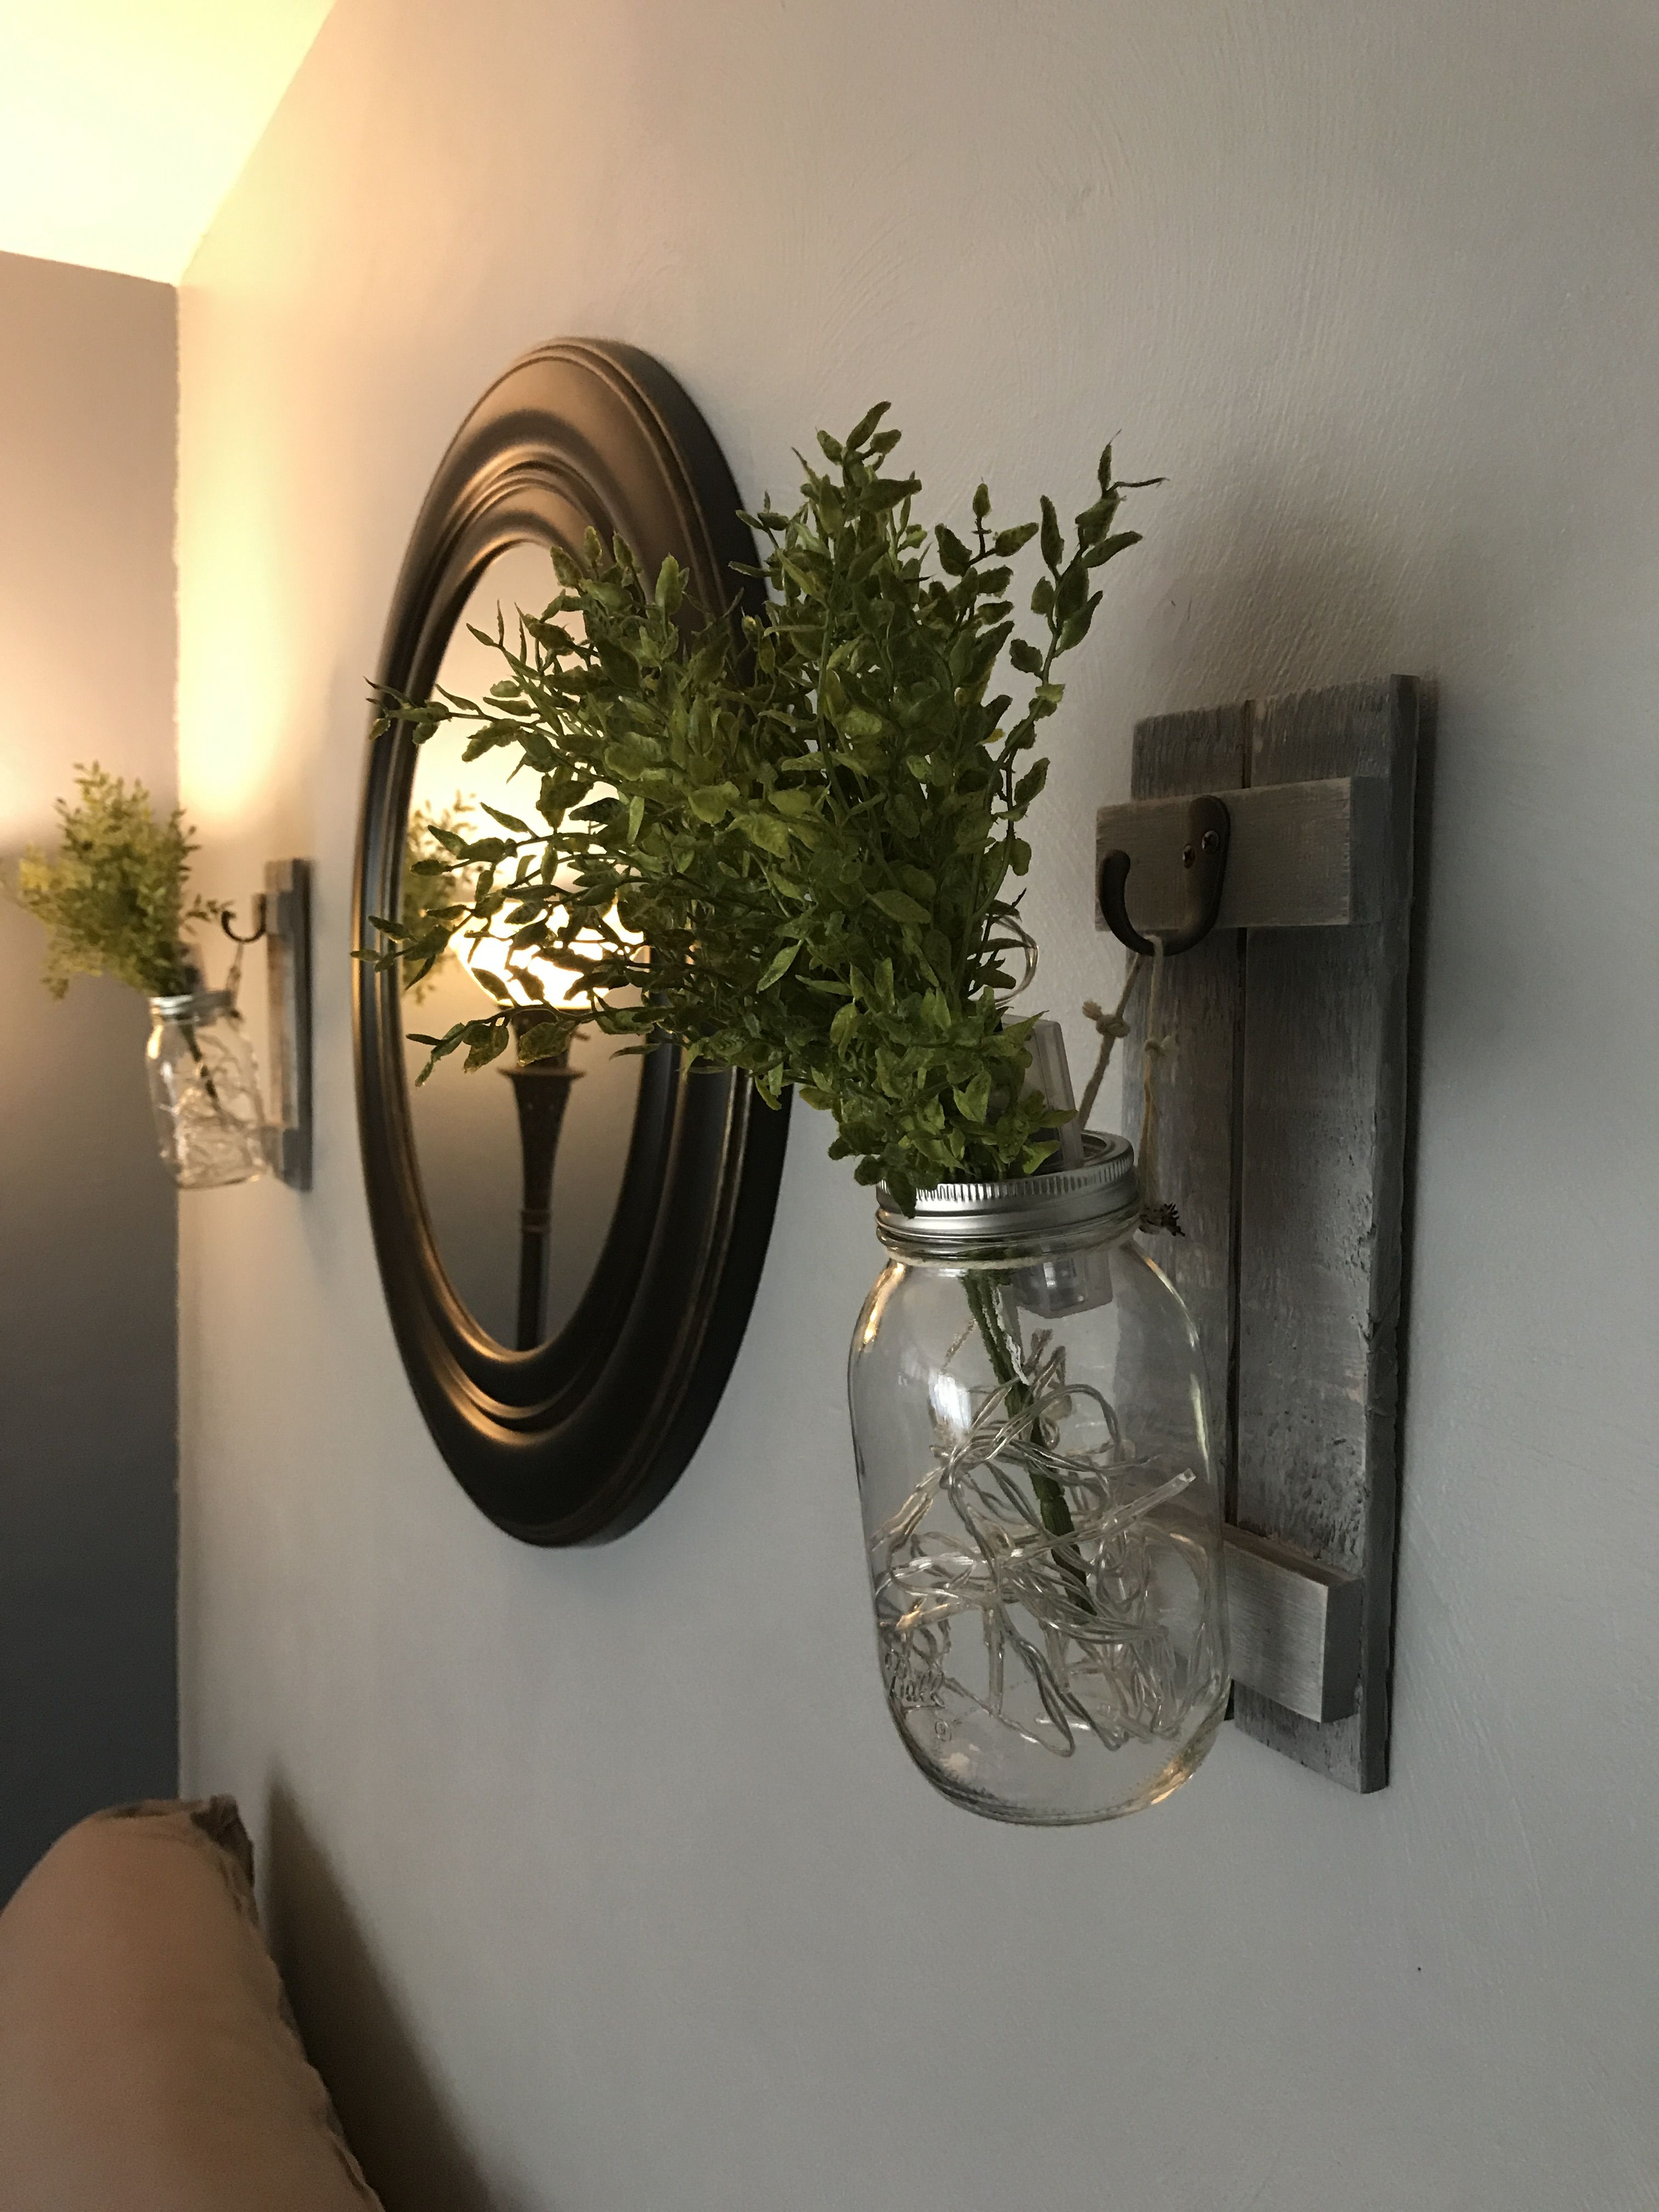 Hanging Wall Lights For Bedroom Mason Jar Wall Sconce Wall Sconces Bedroom Bedroom Diy